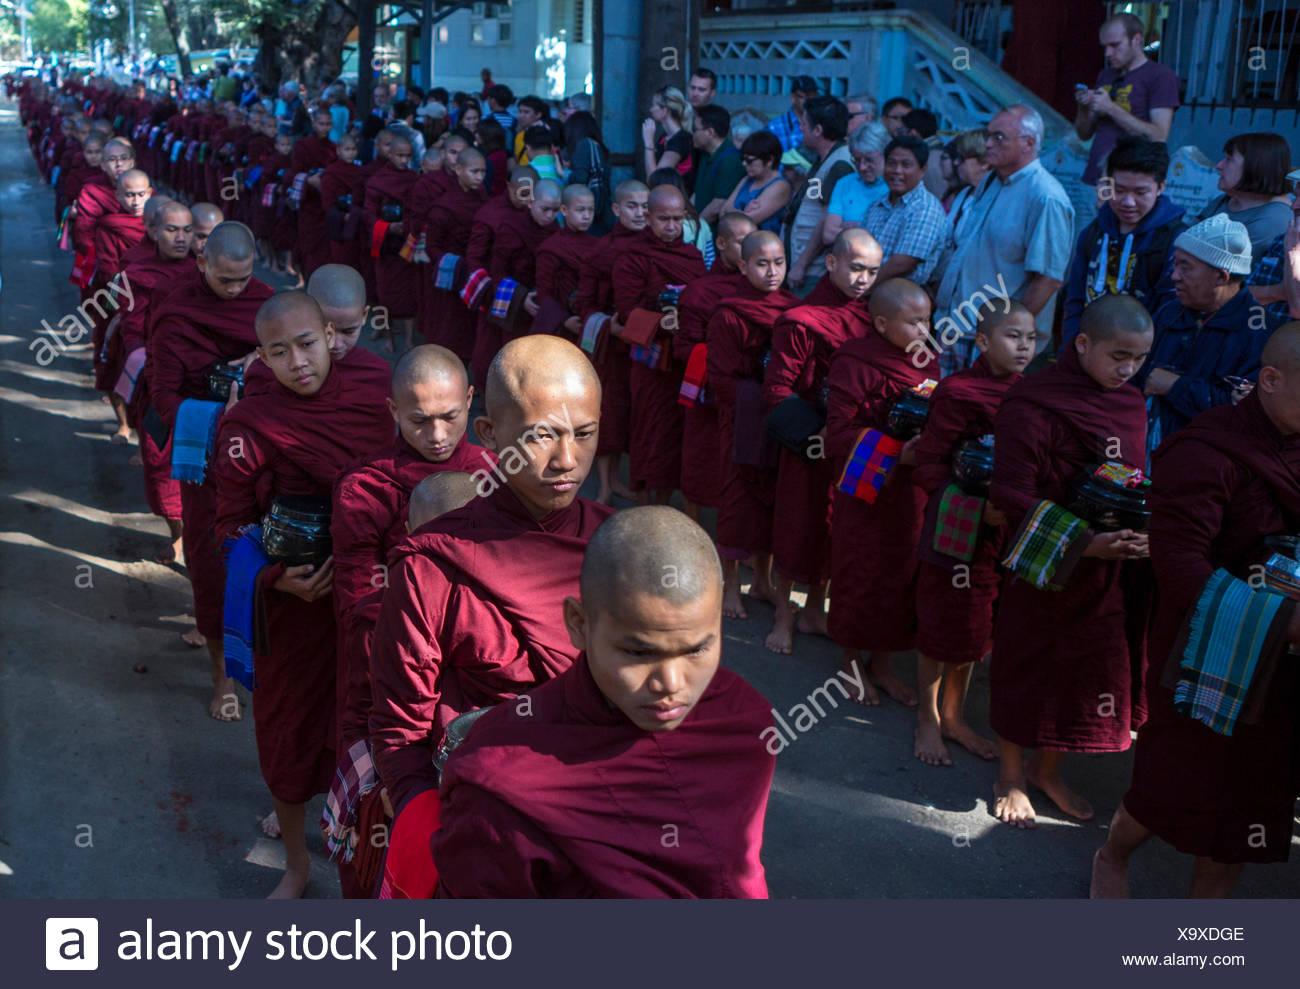 Mandalay Myanmar Burma Asien Parade Attraktion Cue verteilen Lebensmittel Kloster Mönche beten Religion Touristen tradition Stockbild